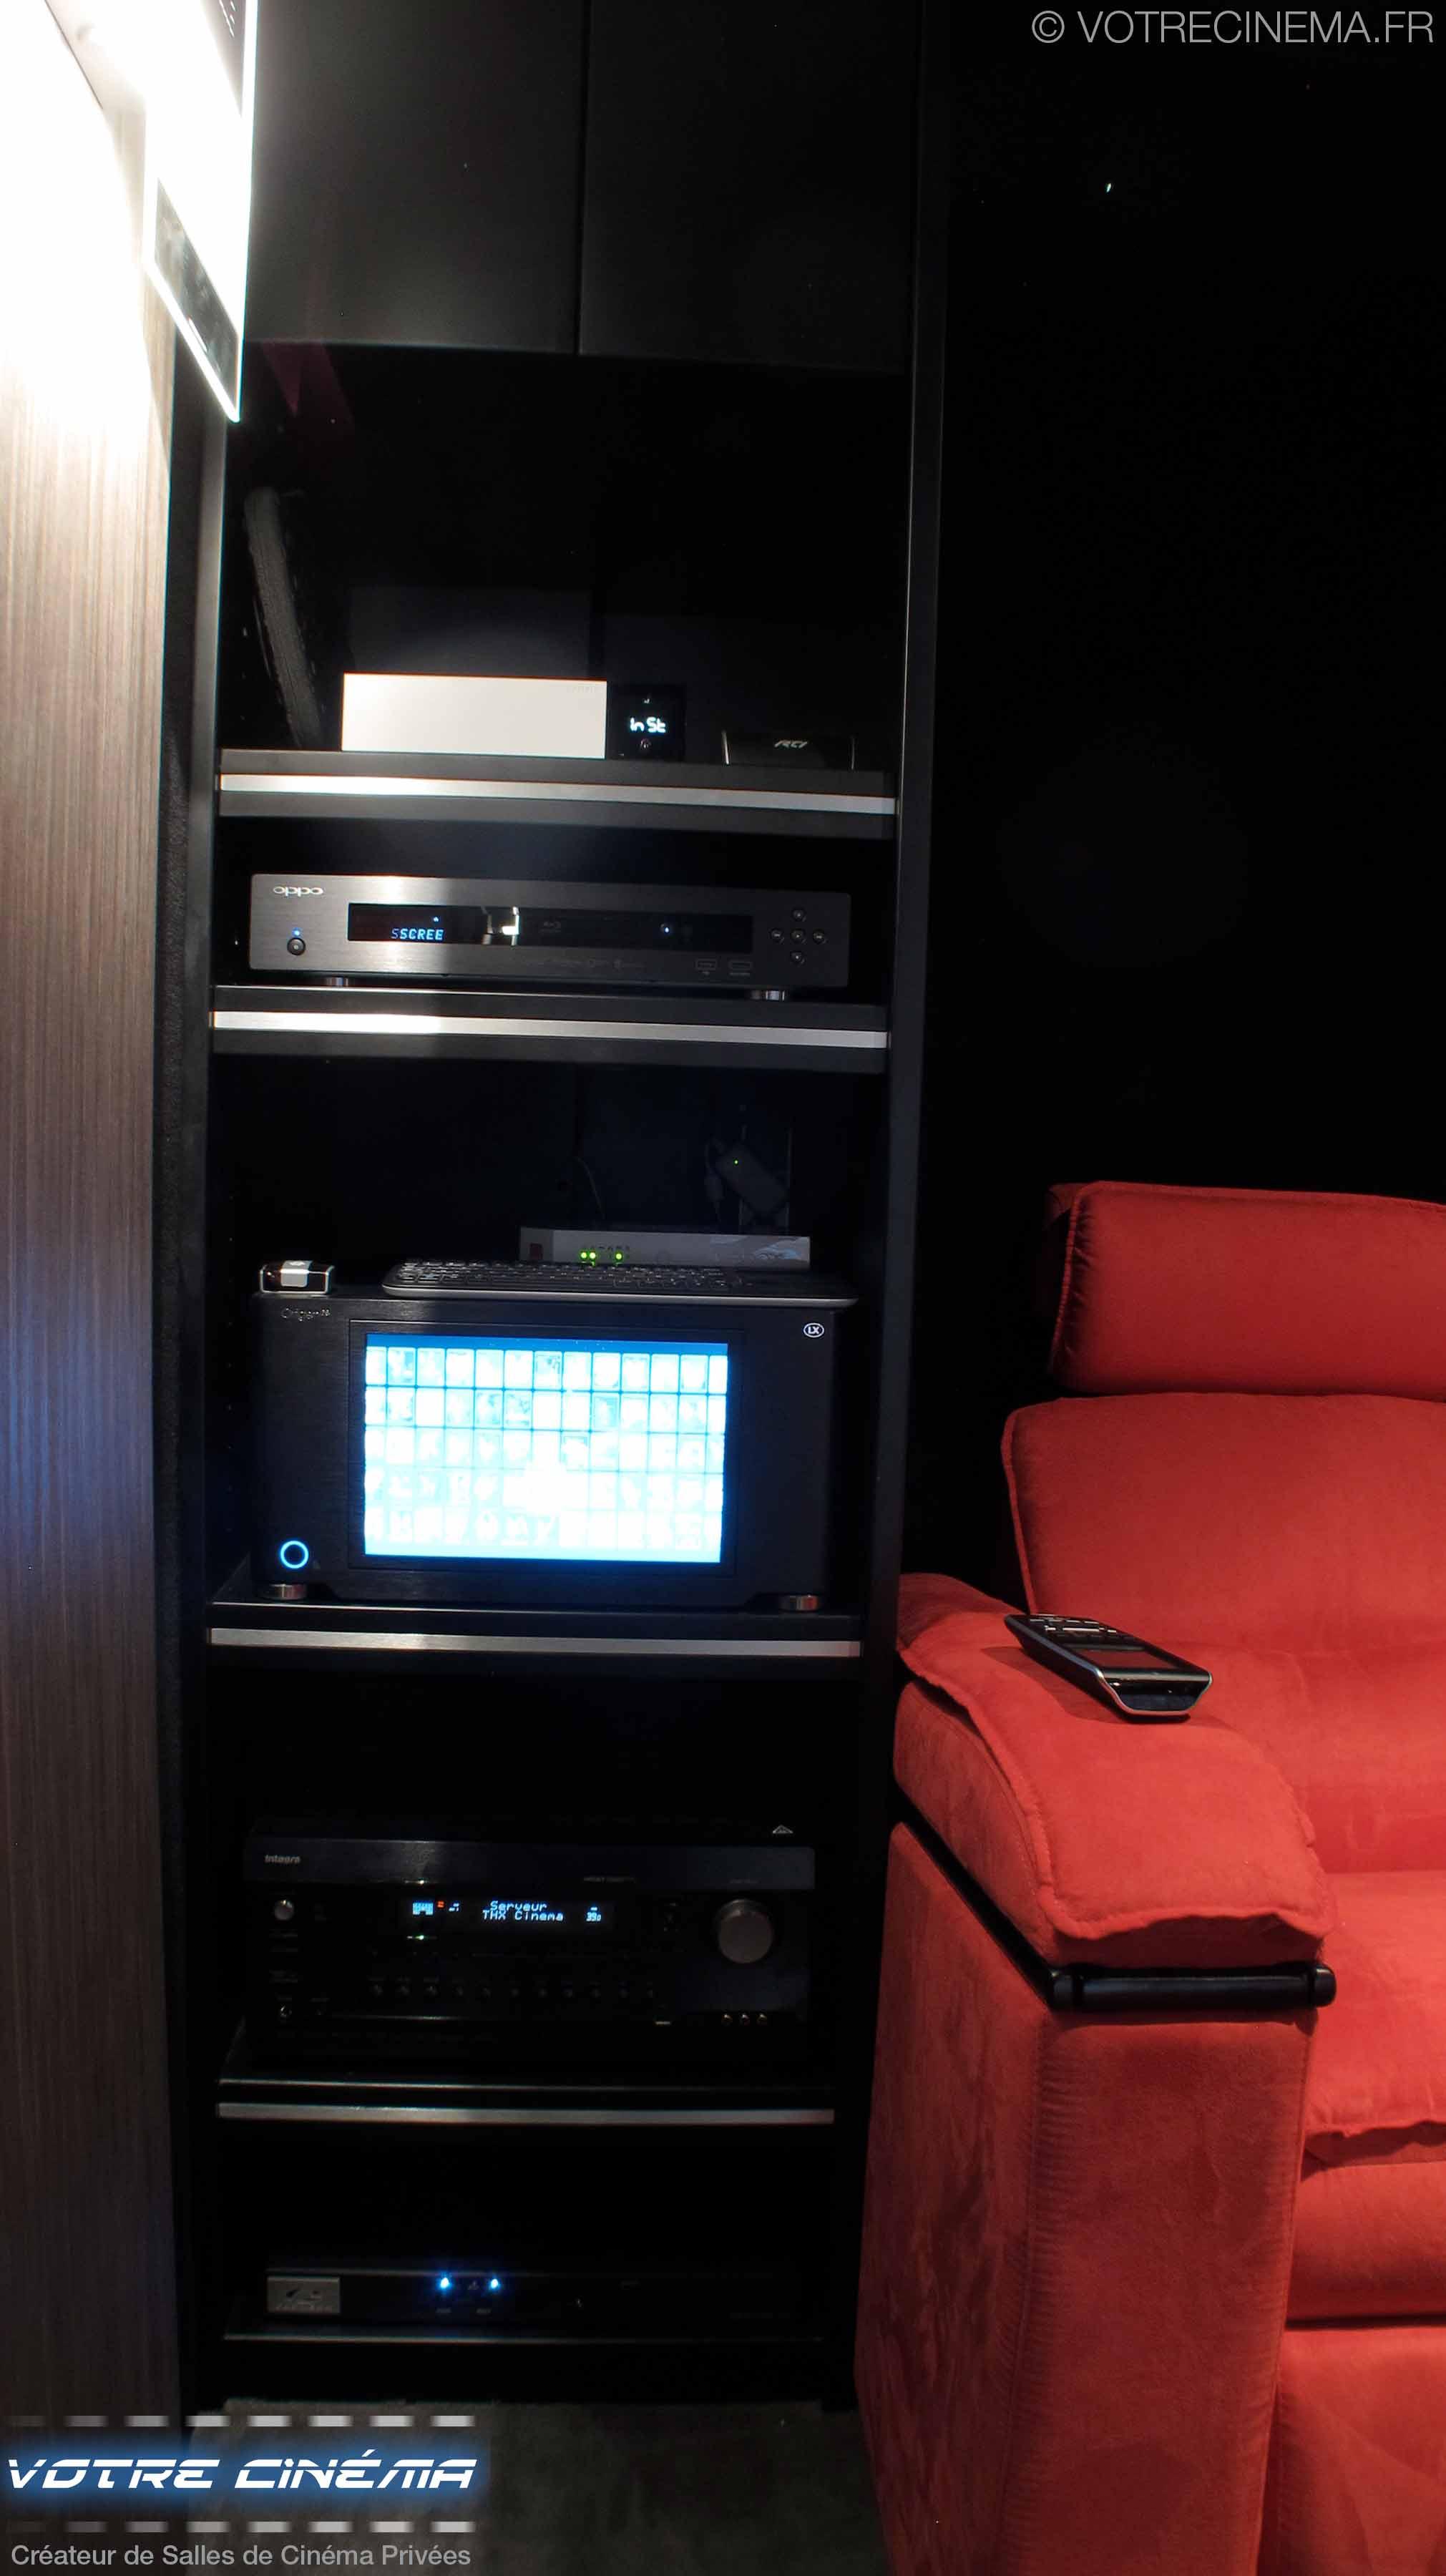 Serveur vidéo home cinema salon de provence